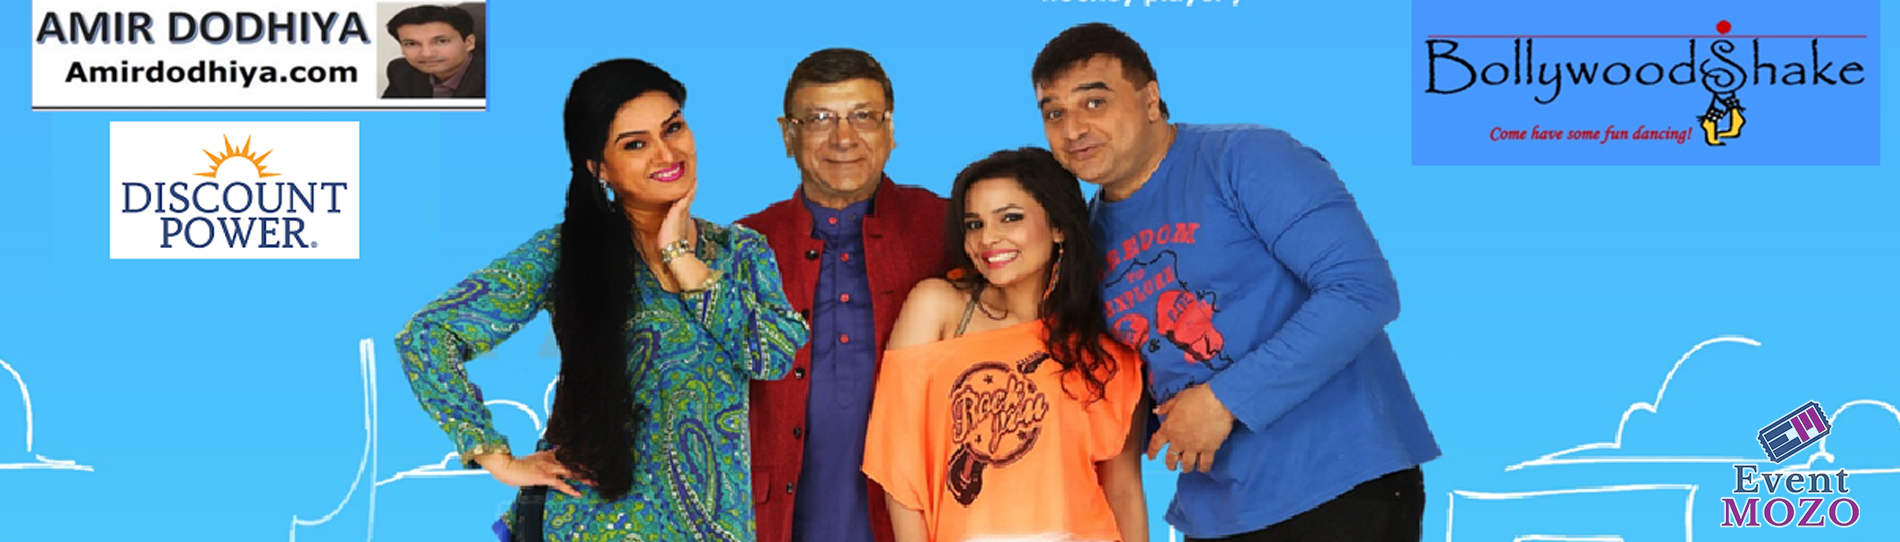 eventmozo Baap Ka Baap Hindi Musical Comedy Play